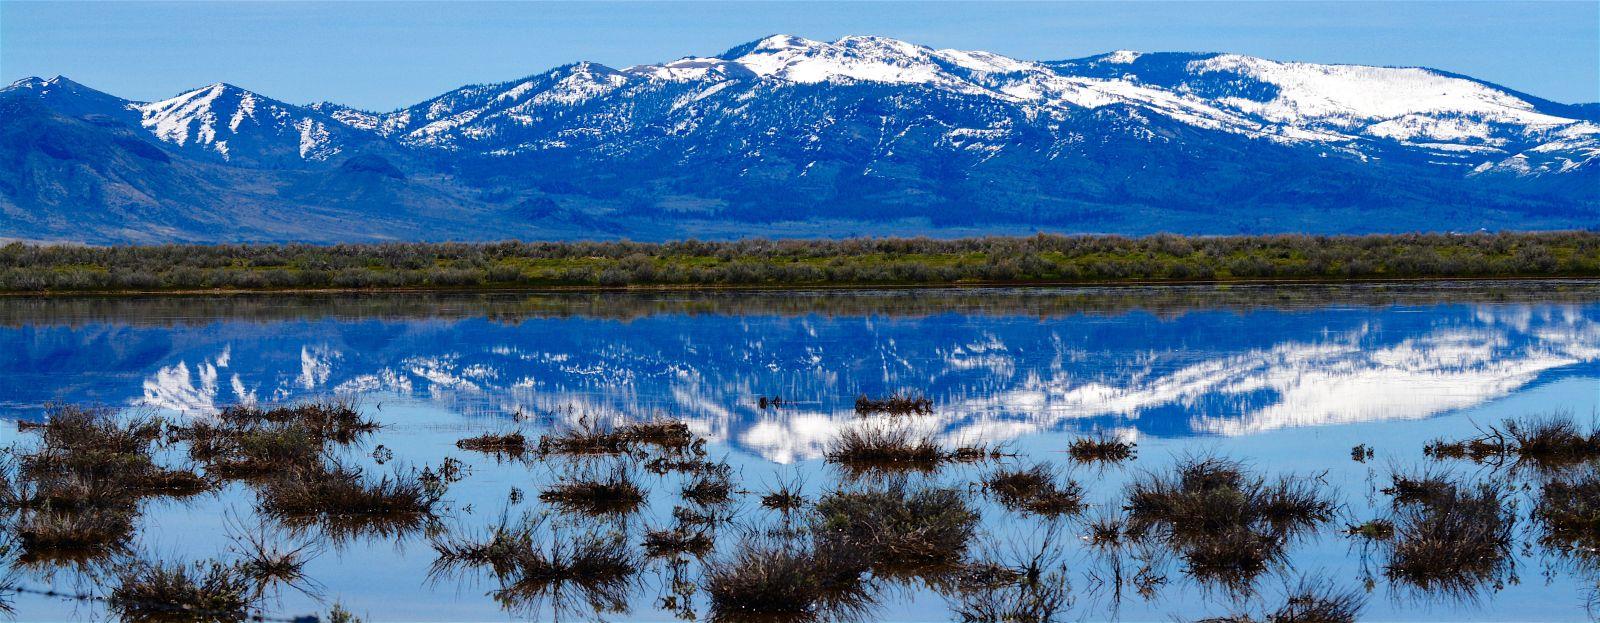 sierra-nevada-mountains-panorama